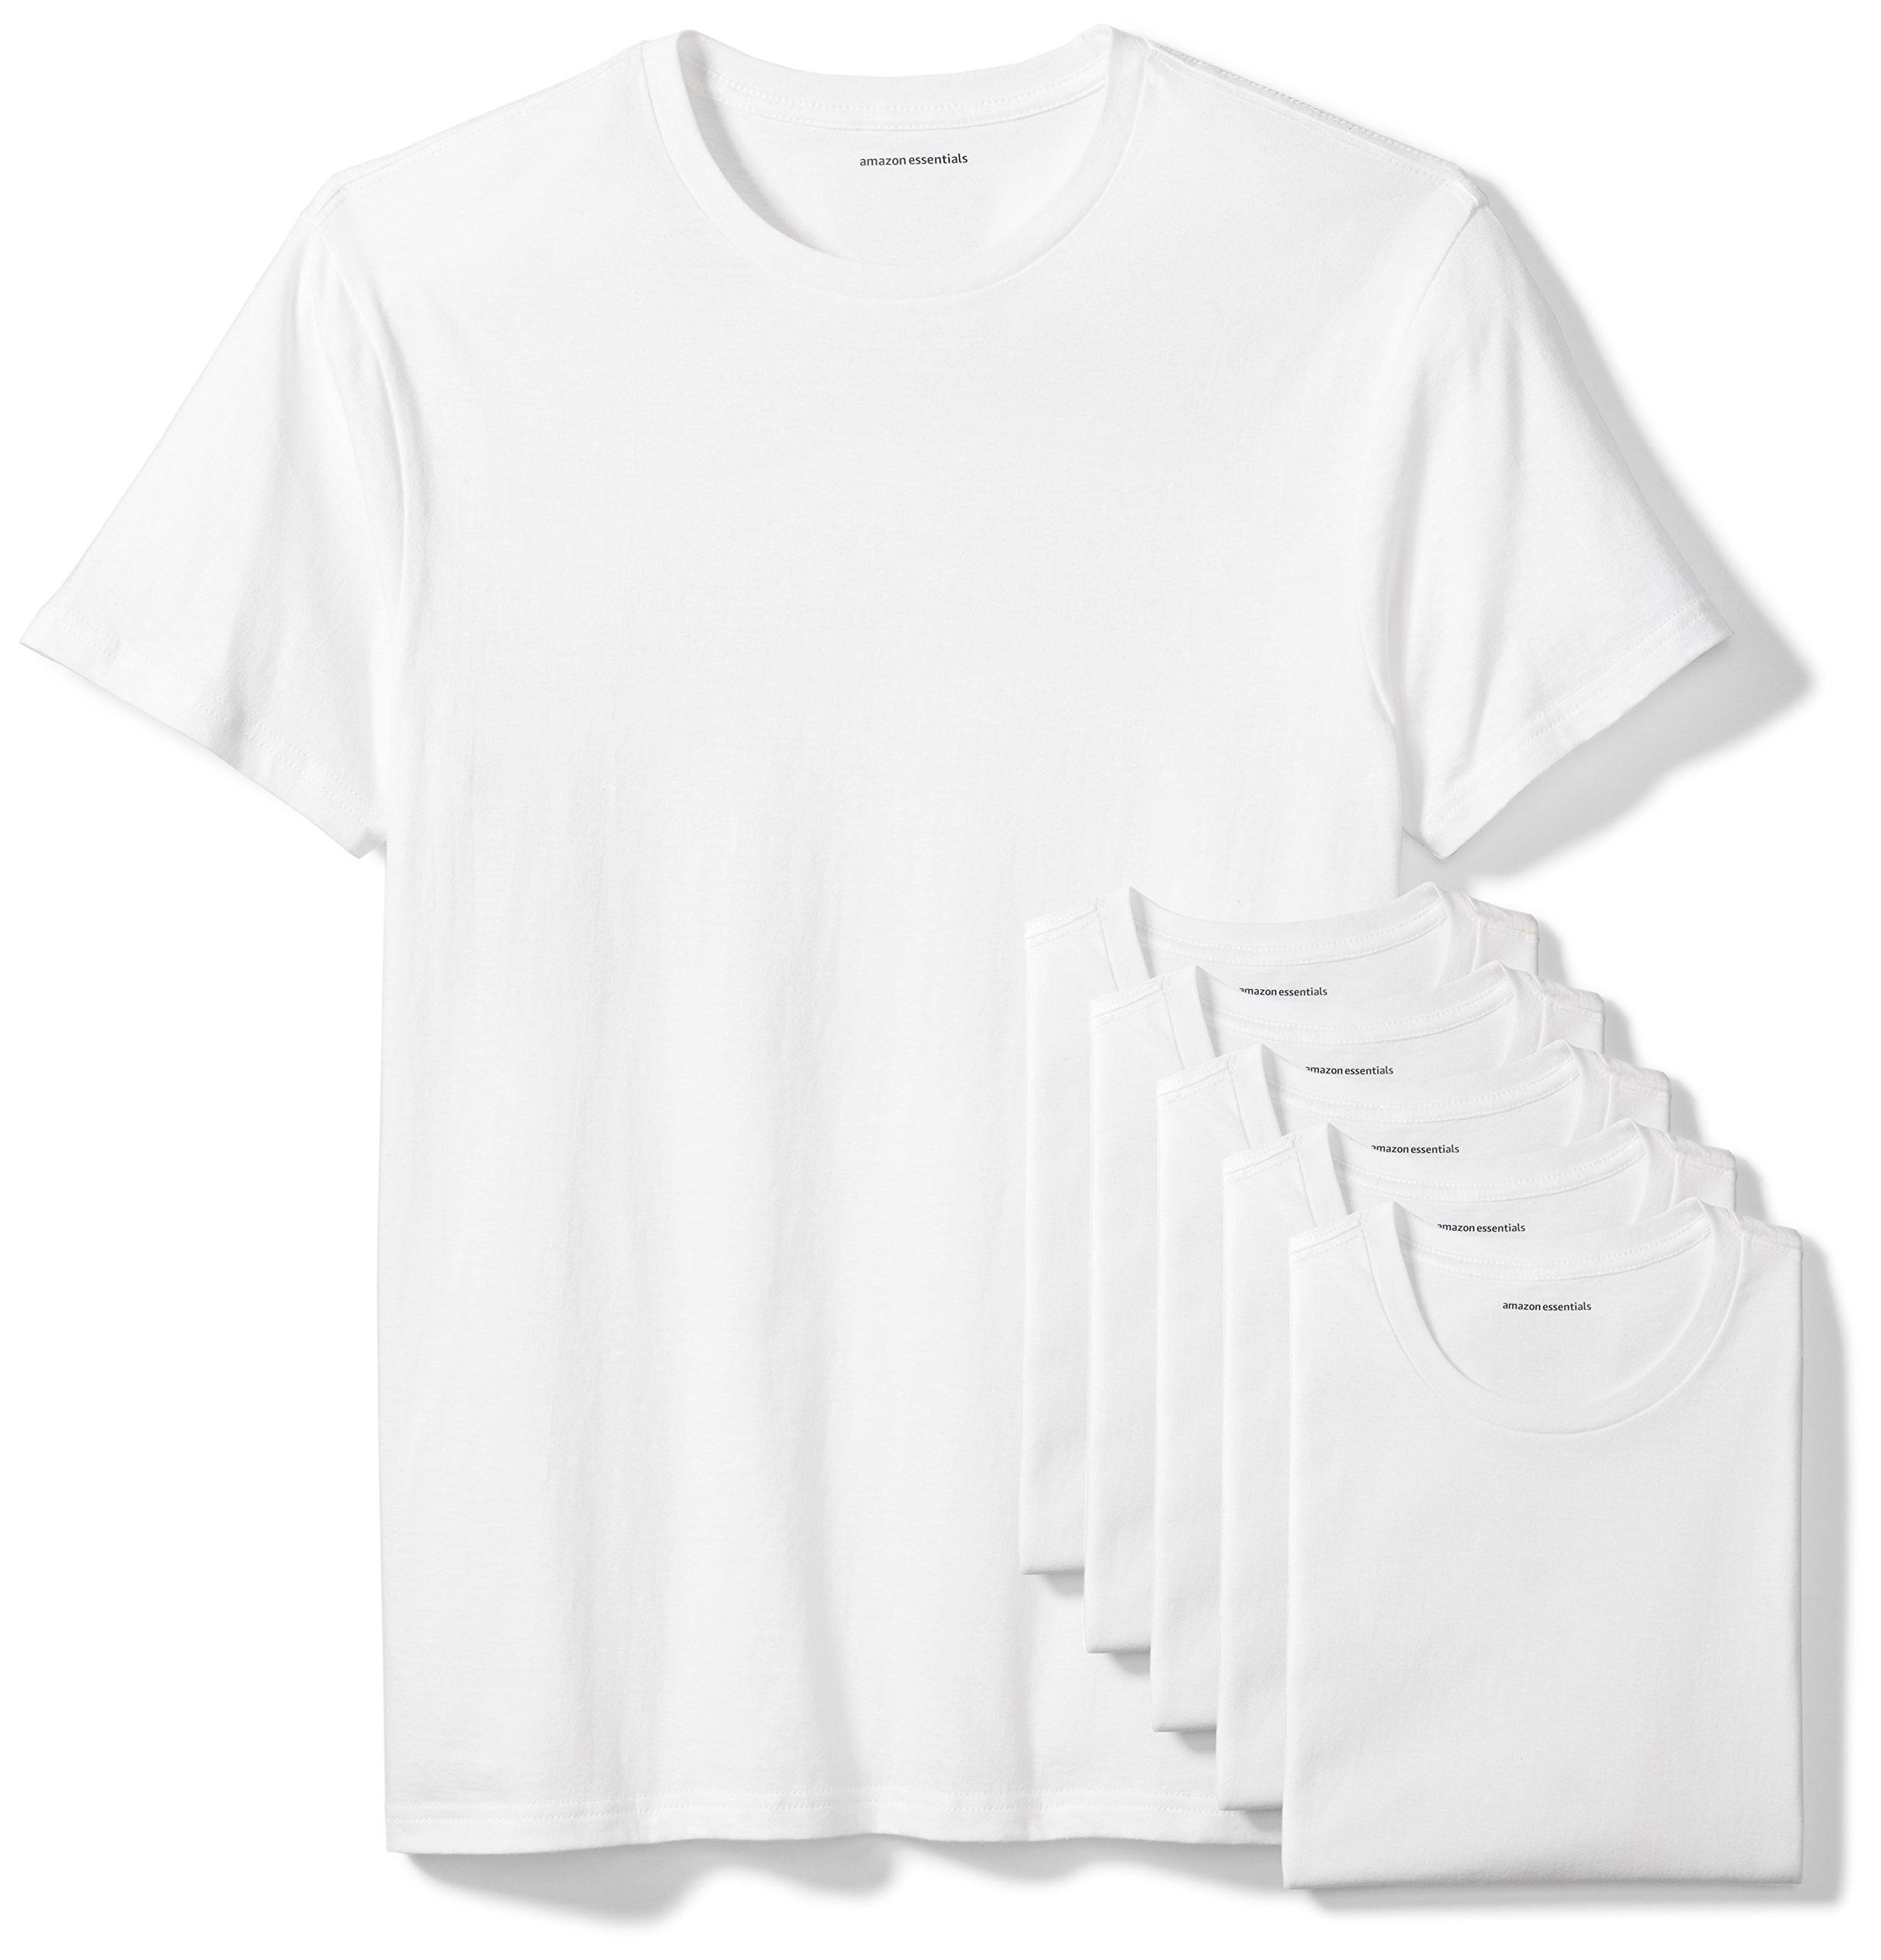 Amazon Essentials Men's 6-Pack Crewneck Undershirts, White, Large by Amazon Essentials